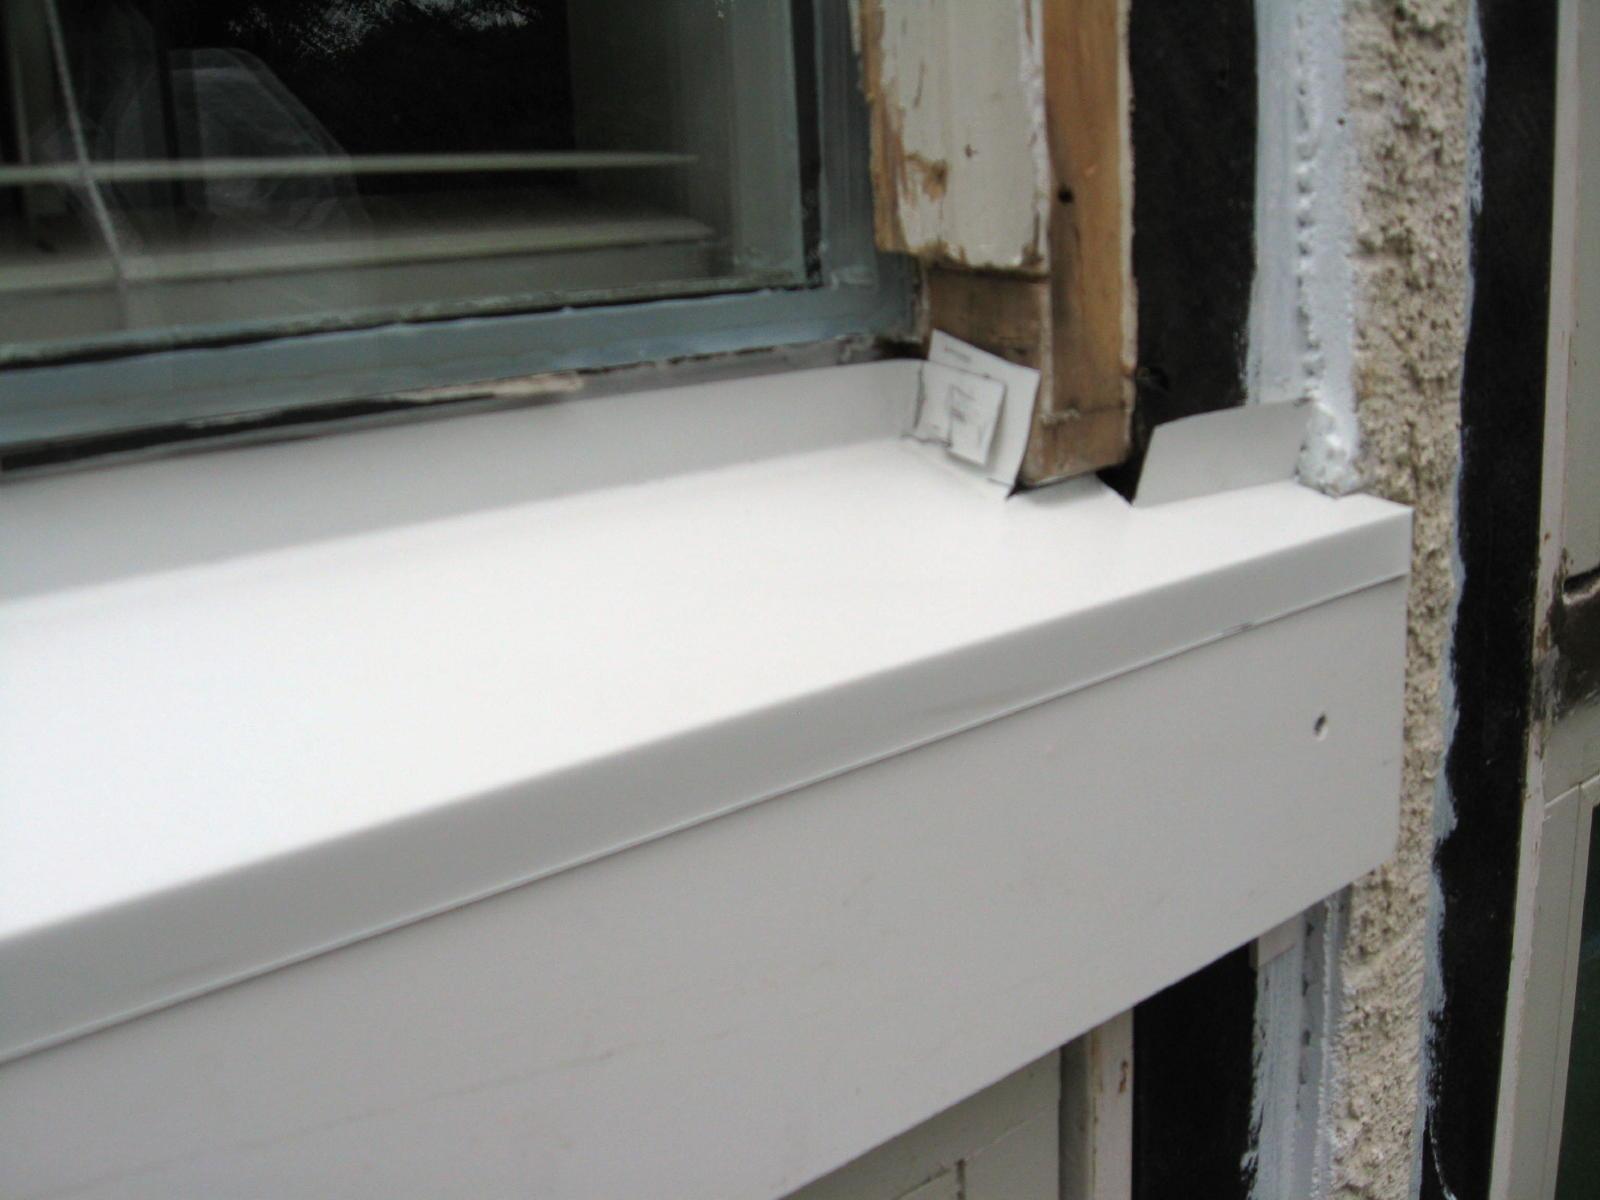 How To Install Duraflash Vinyl Deck Flashing Code Radinabox